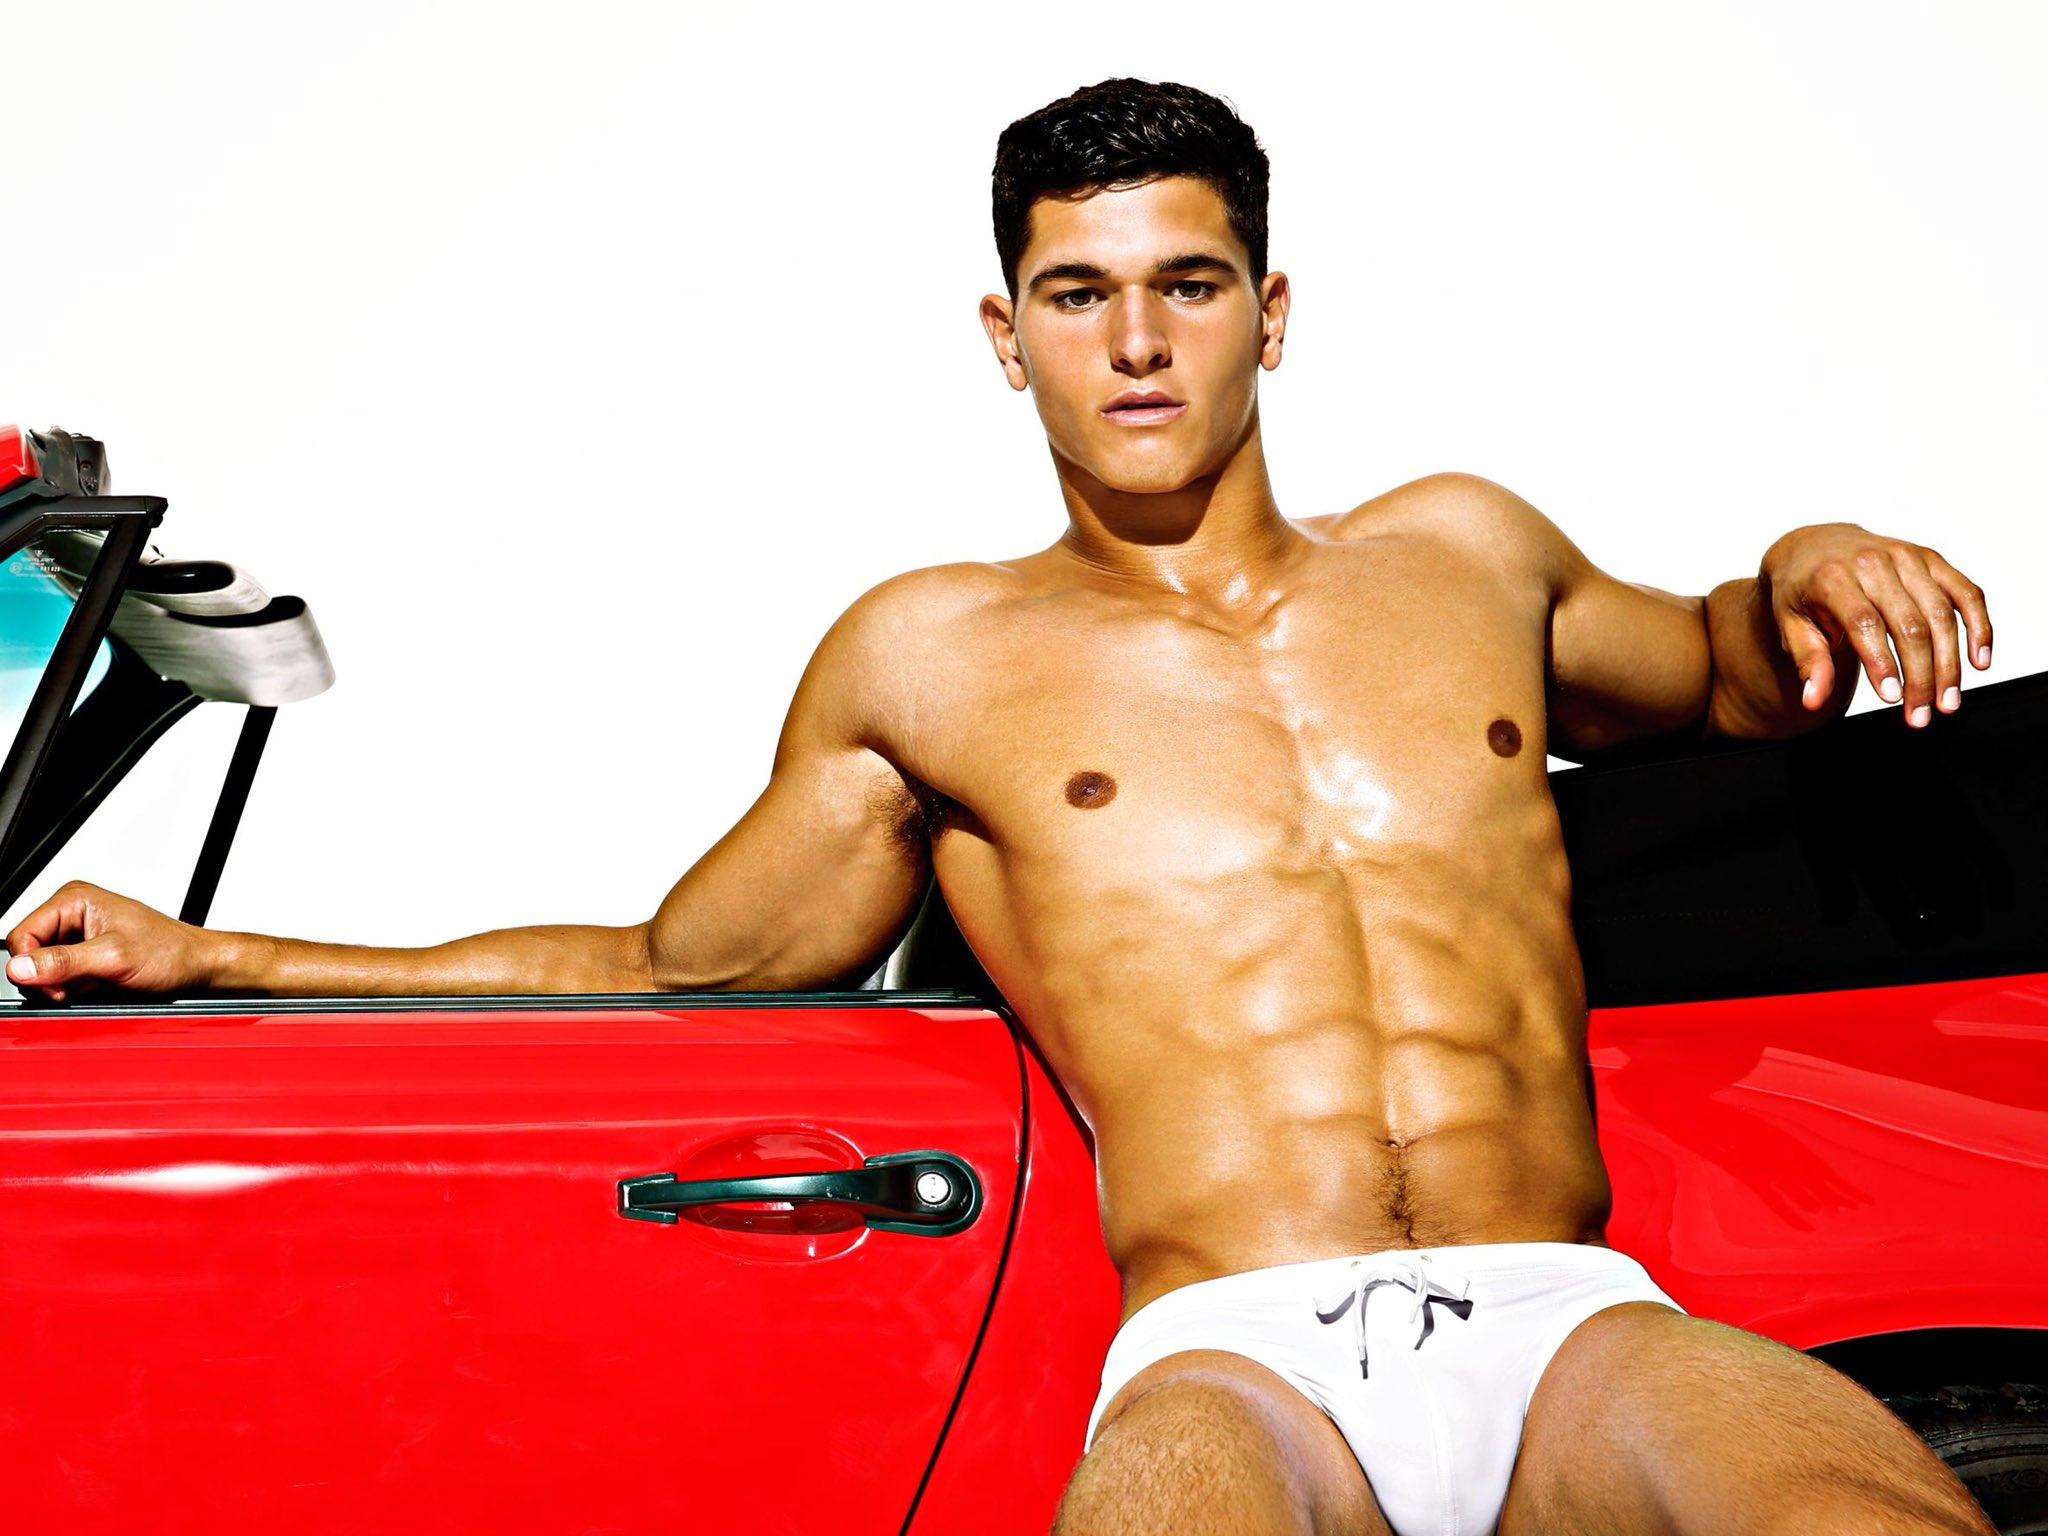 Hottie in a Red Car 🚗 TREVOR SIGNORINO ♥️ For Charlie by Matthew Zink @charliebymz 🧡💛💚💙💜 #Sexy #Stud #Hottie #HumpDay #MaleSuperModel #Handsome #ModelOfTheMonth #August #DamnHotBod #Yummy https://t.co/7b7AxlyiQ5